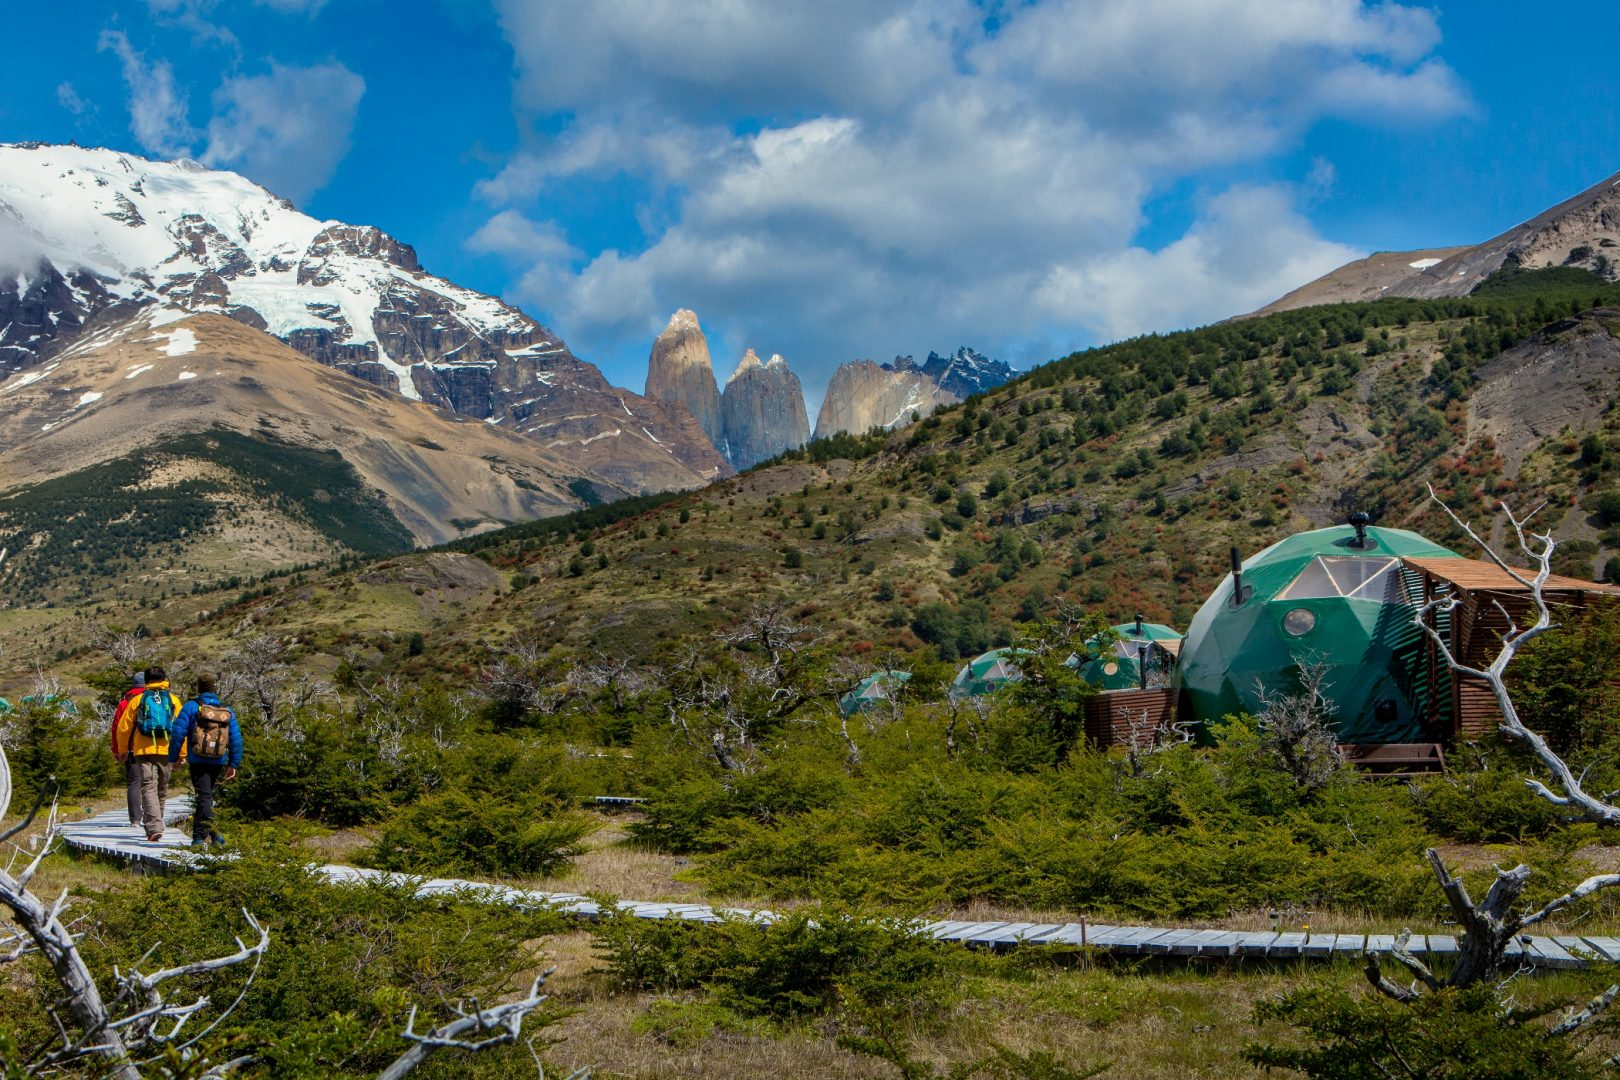 Ecocamp Patagonia Vaya Adventures